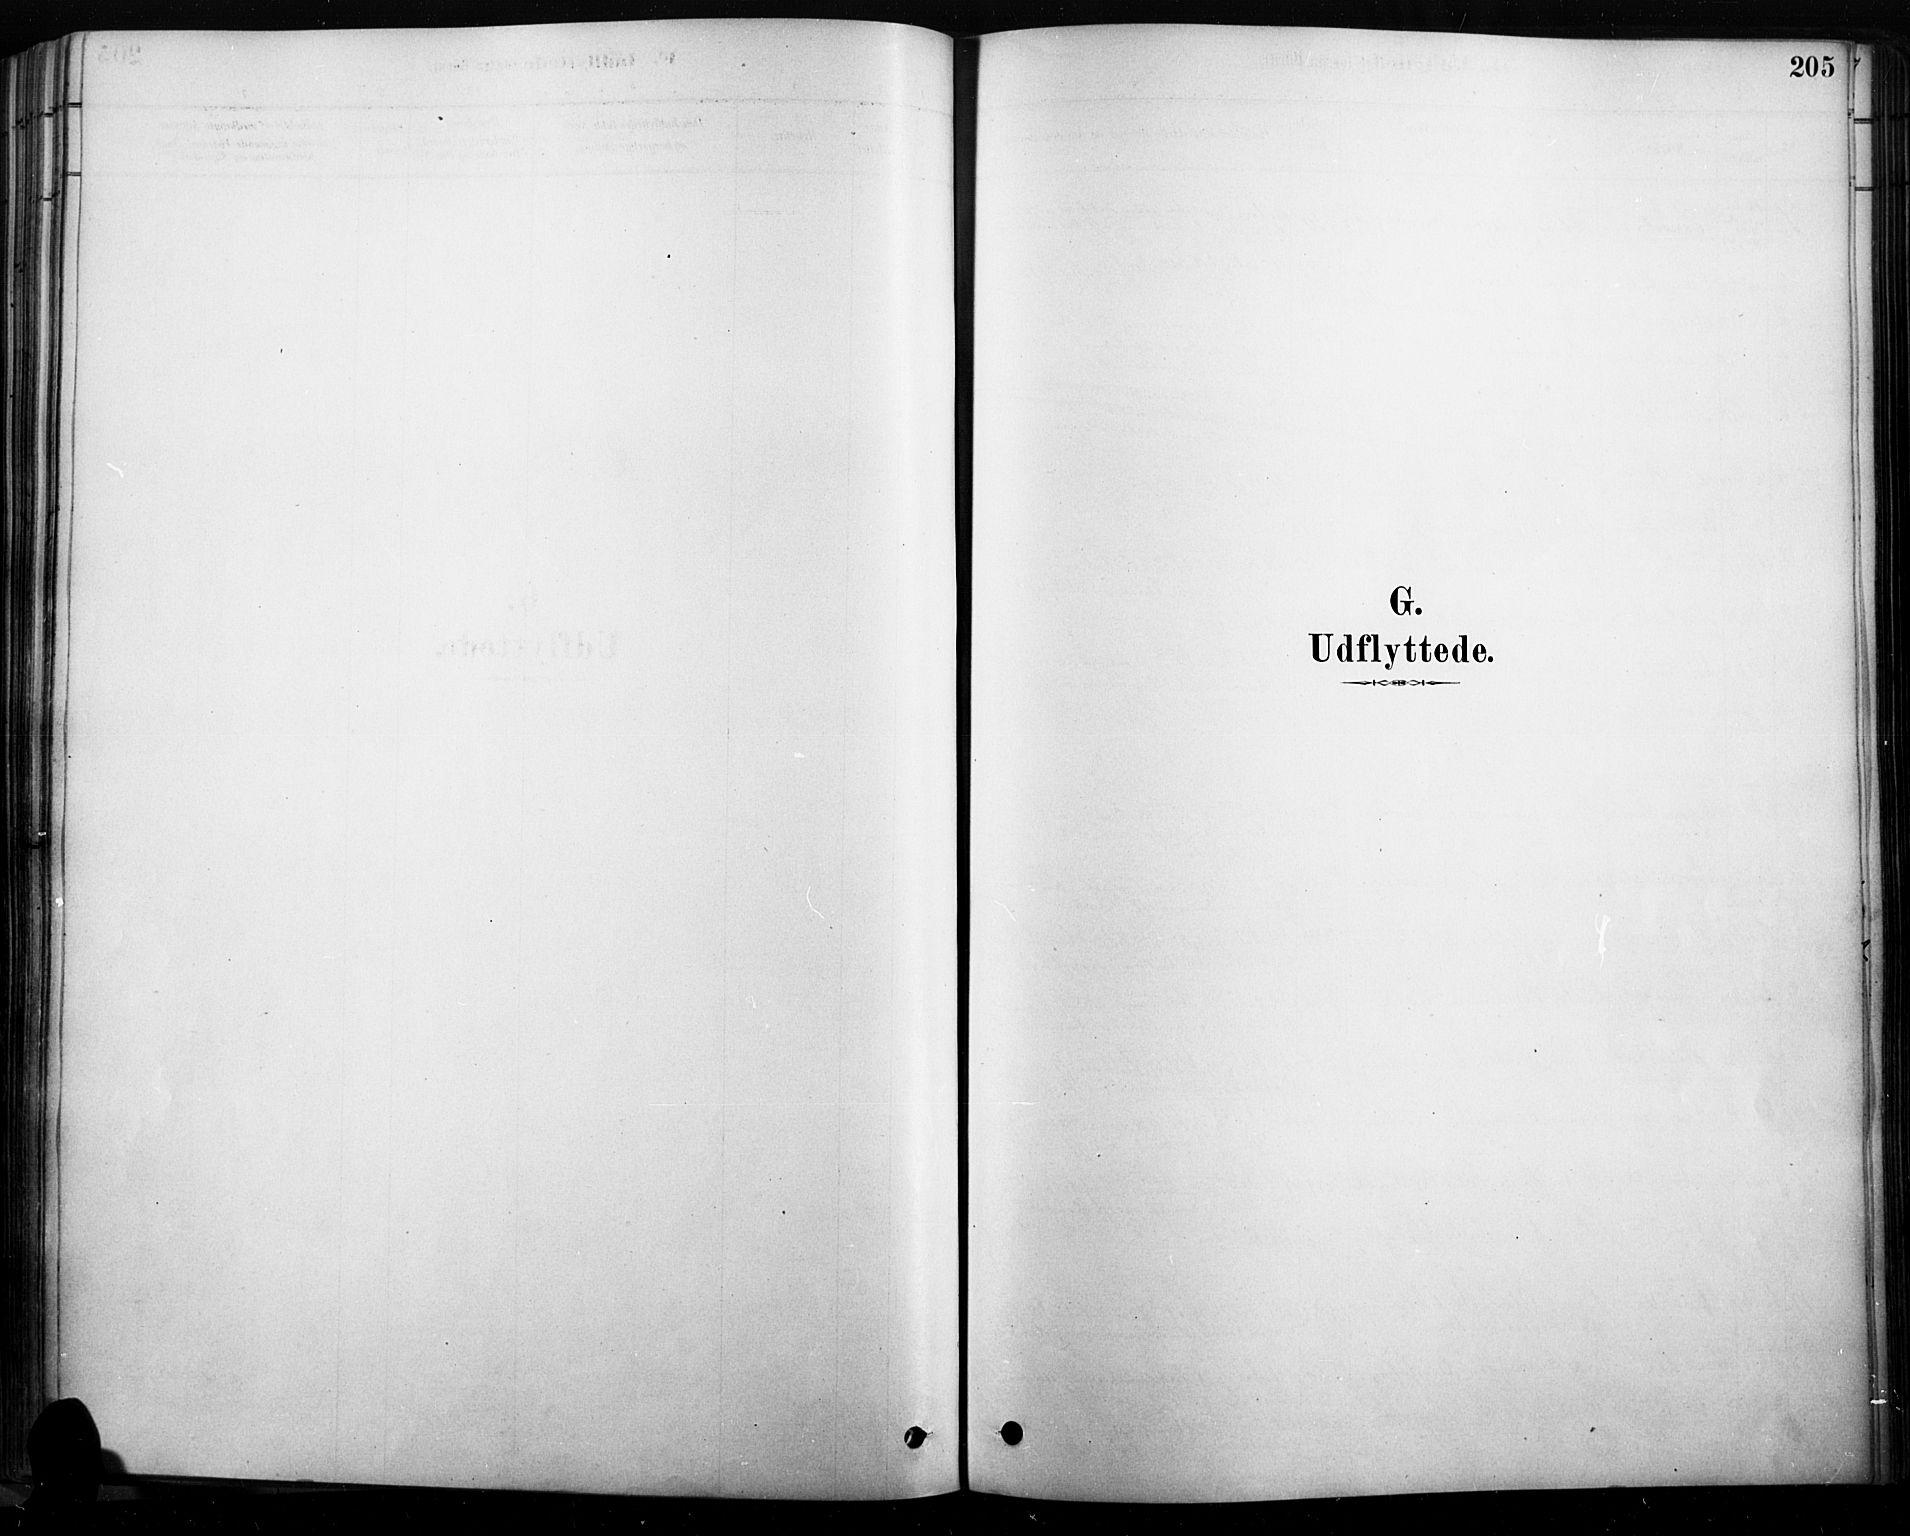 SAH, Rendalen prestekontor, H/Ha/Haa/L0009: Ministerialbok nr. 9, 1878-1901, s. 205